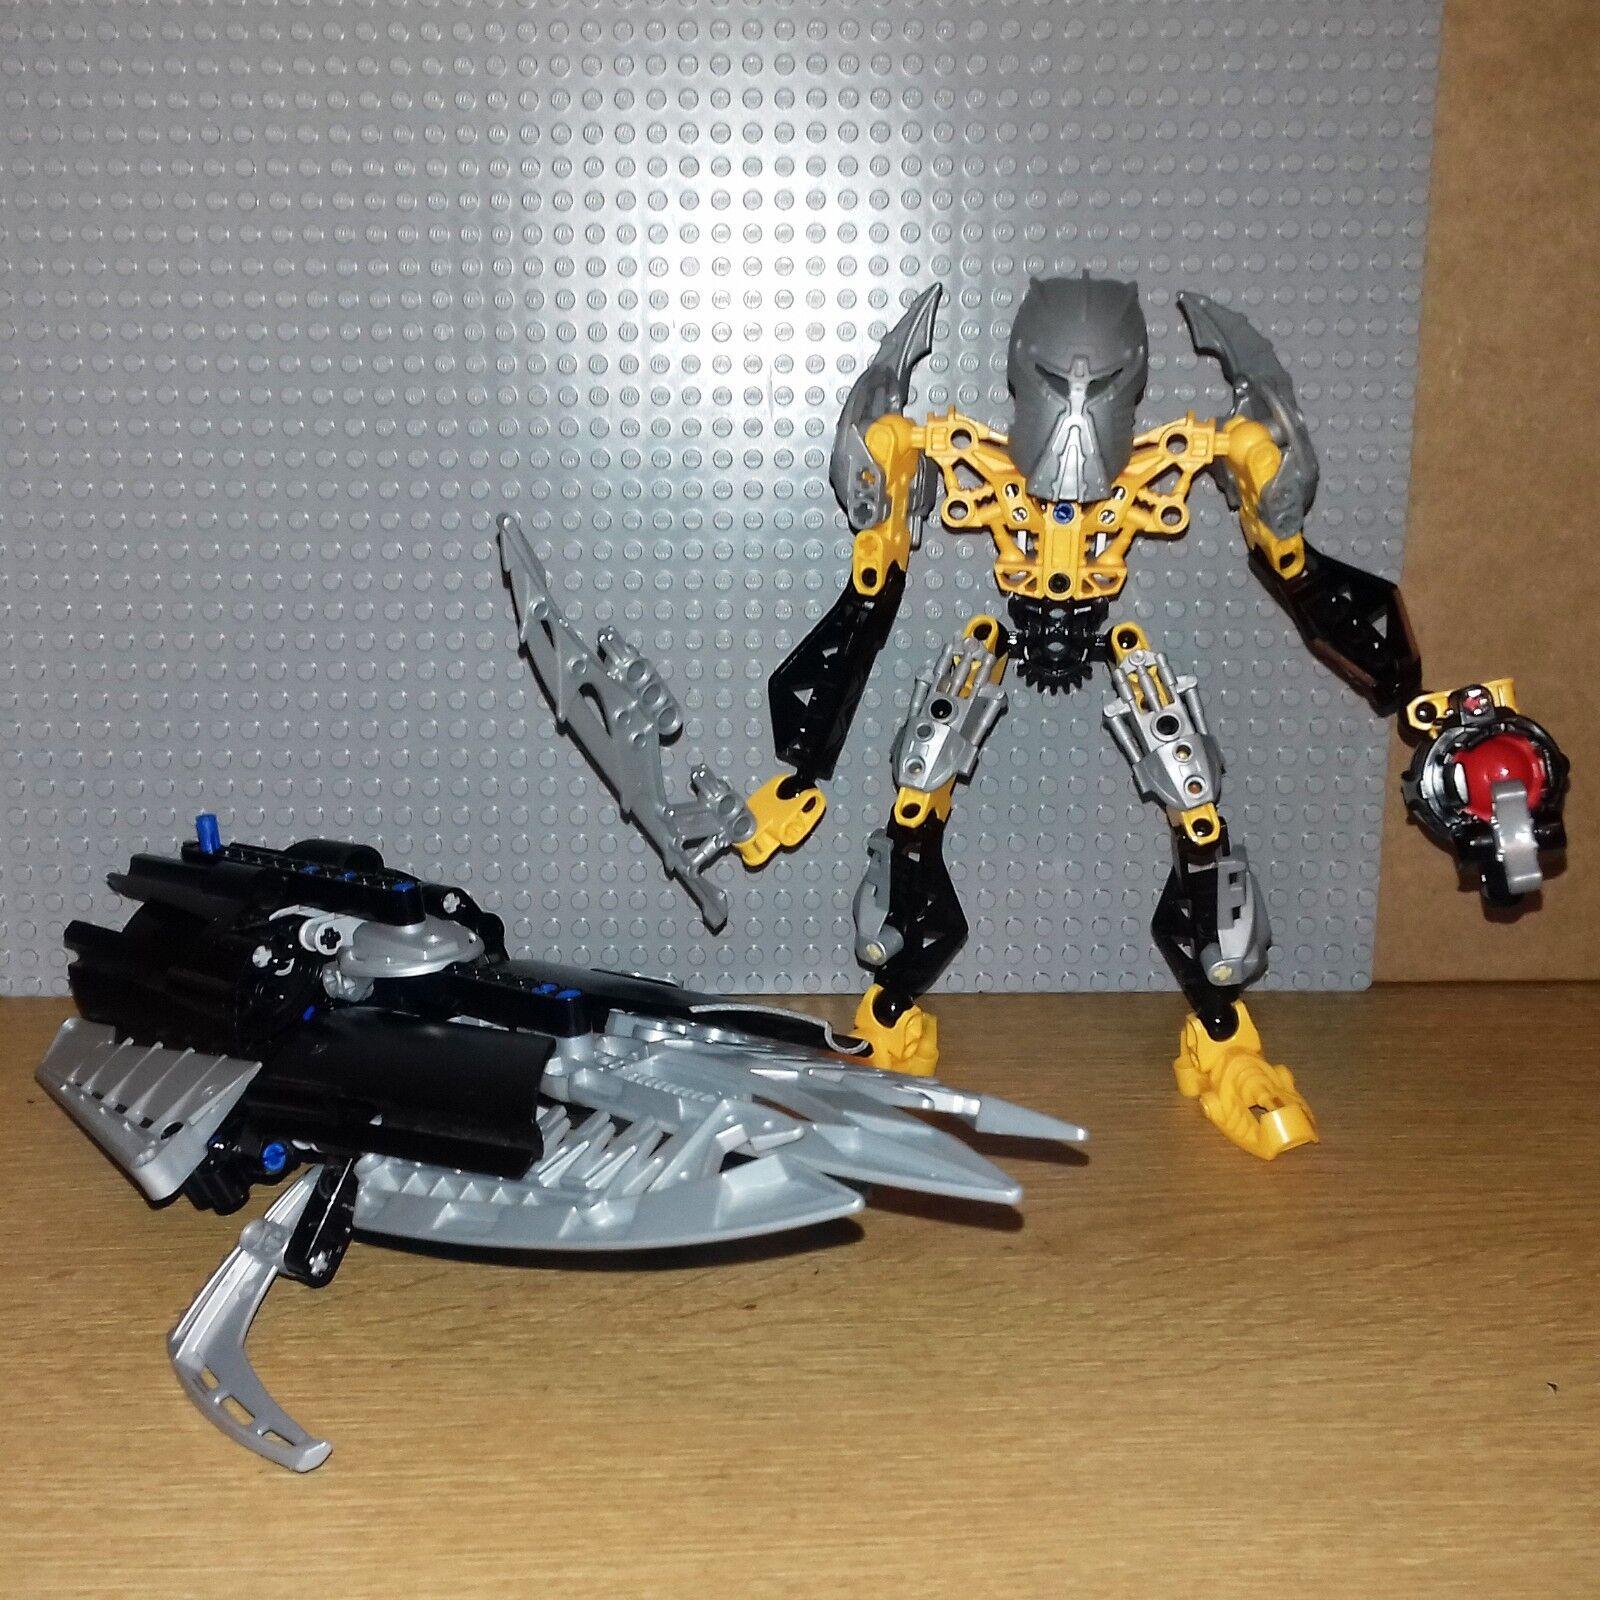 LEGO BIONICLE WARRIORS - 8697 - TOA IGNIKA